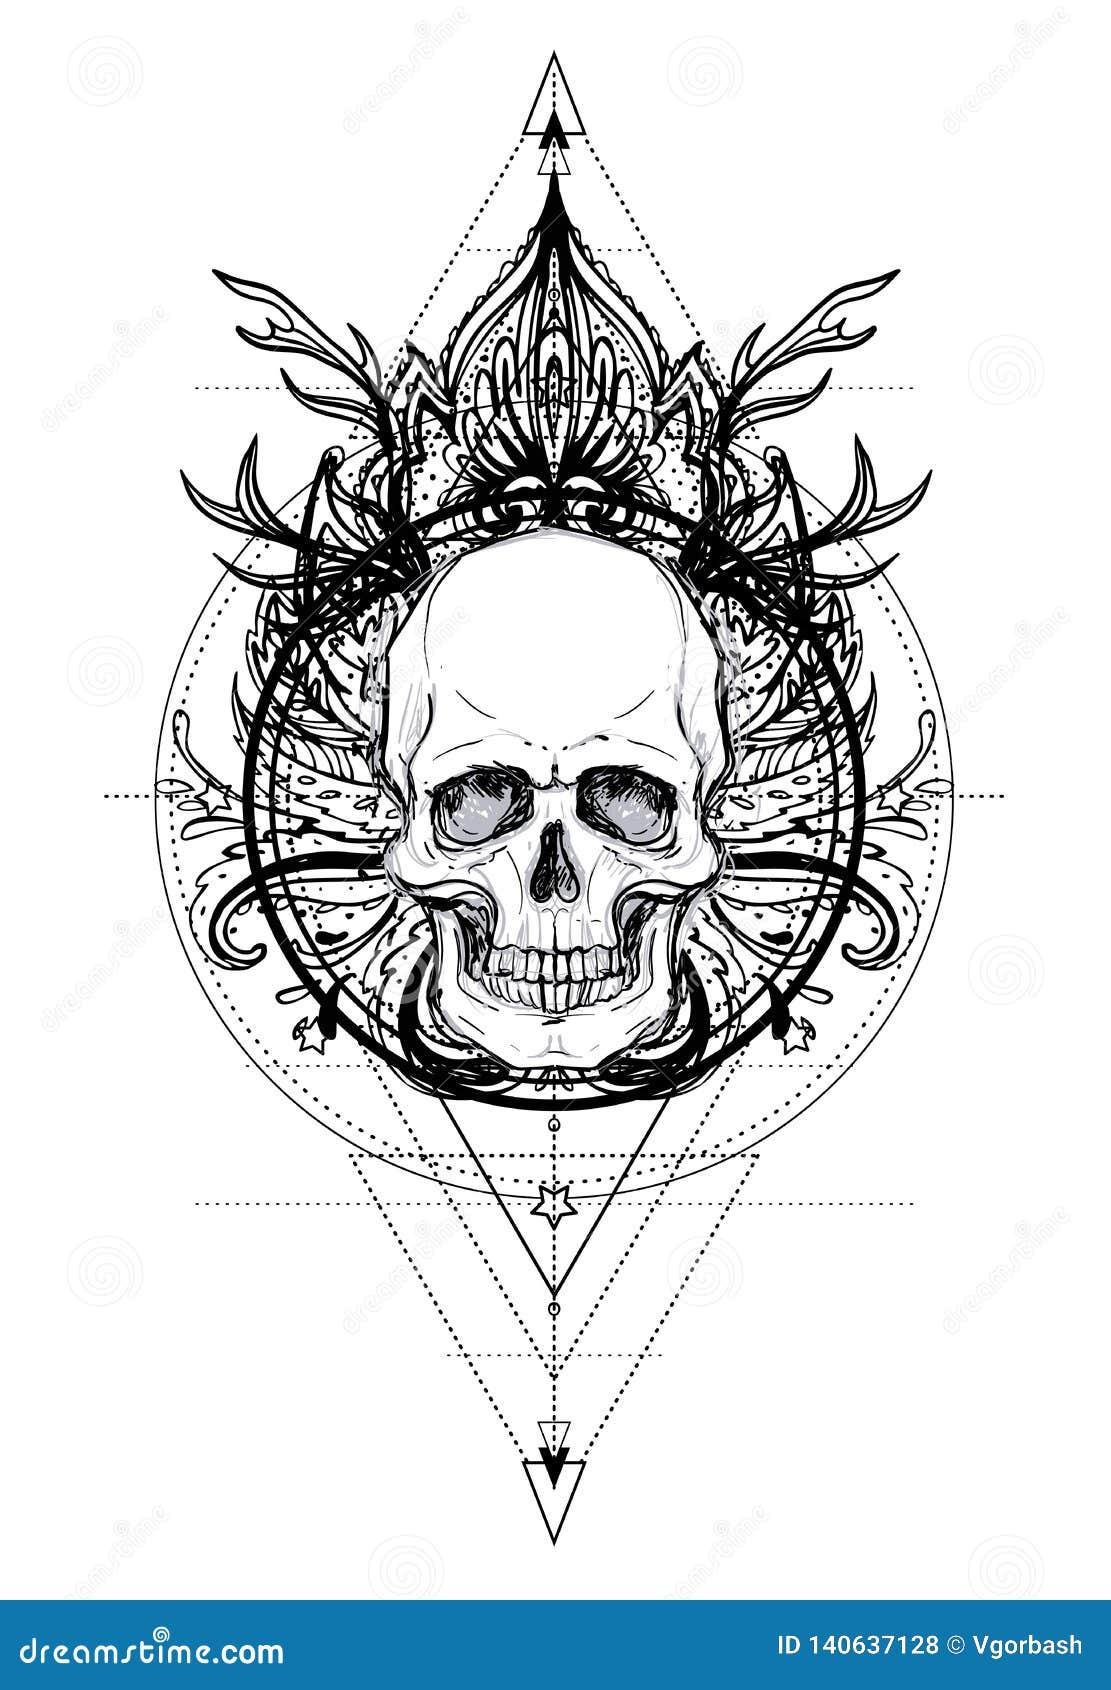 721b4b98d Ayurveda symbol of harmony and balance. Tattoo flesh design, yoga logo.  Boho print, poster, t-shirt textile. Isolated illustration